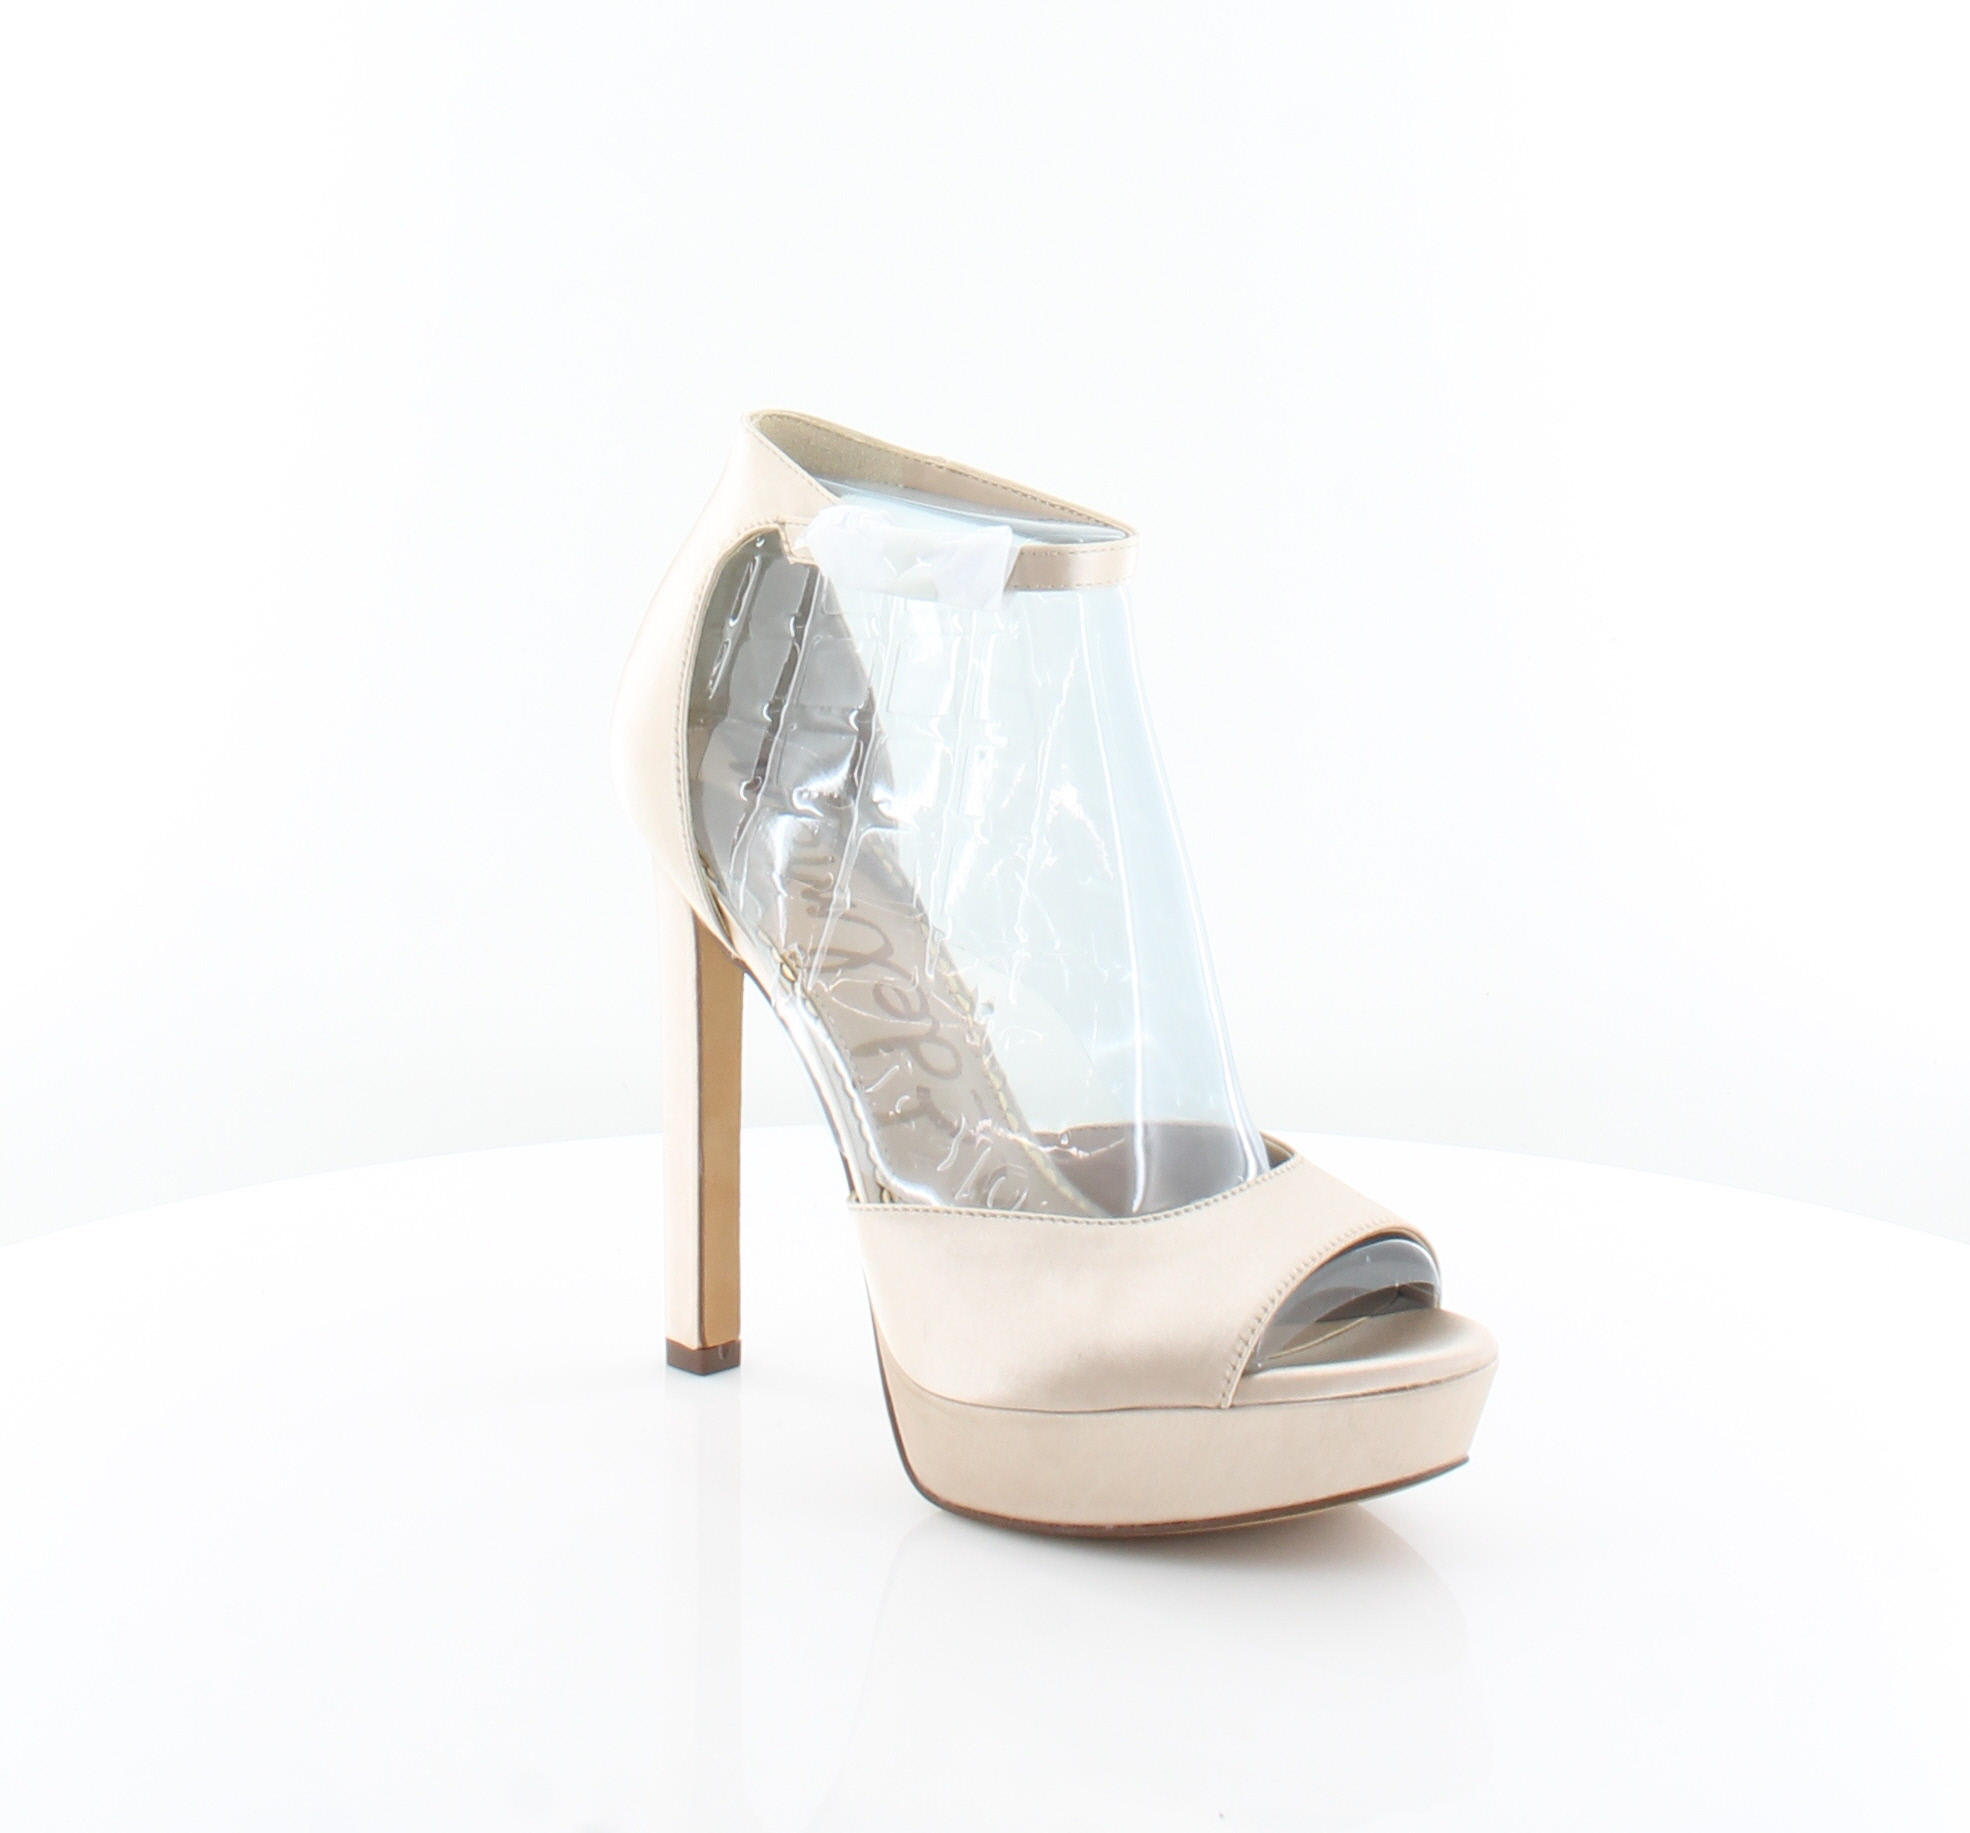 b2a8166d7172 Sam Edelman Wallace Gold Womens Shoes Size 9.5 M Heels MSRP  120 ...